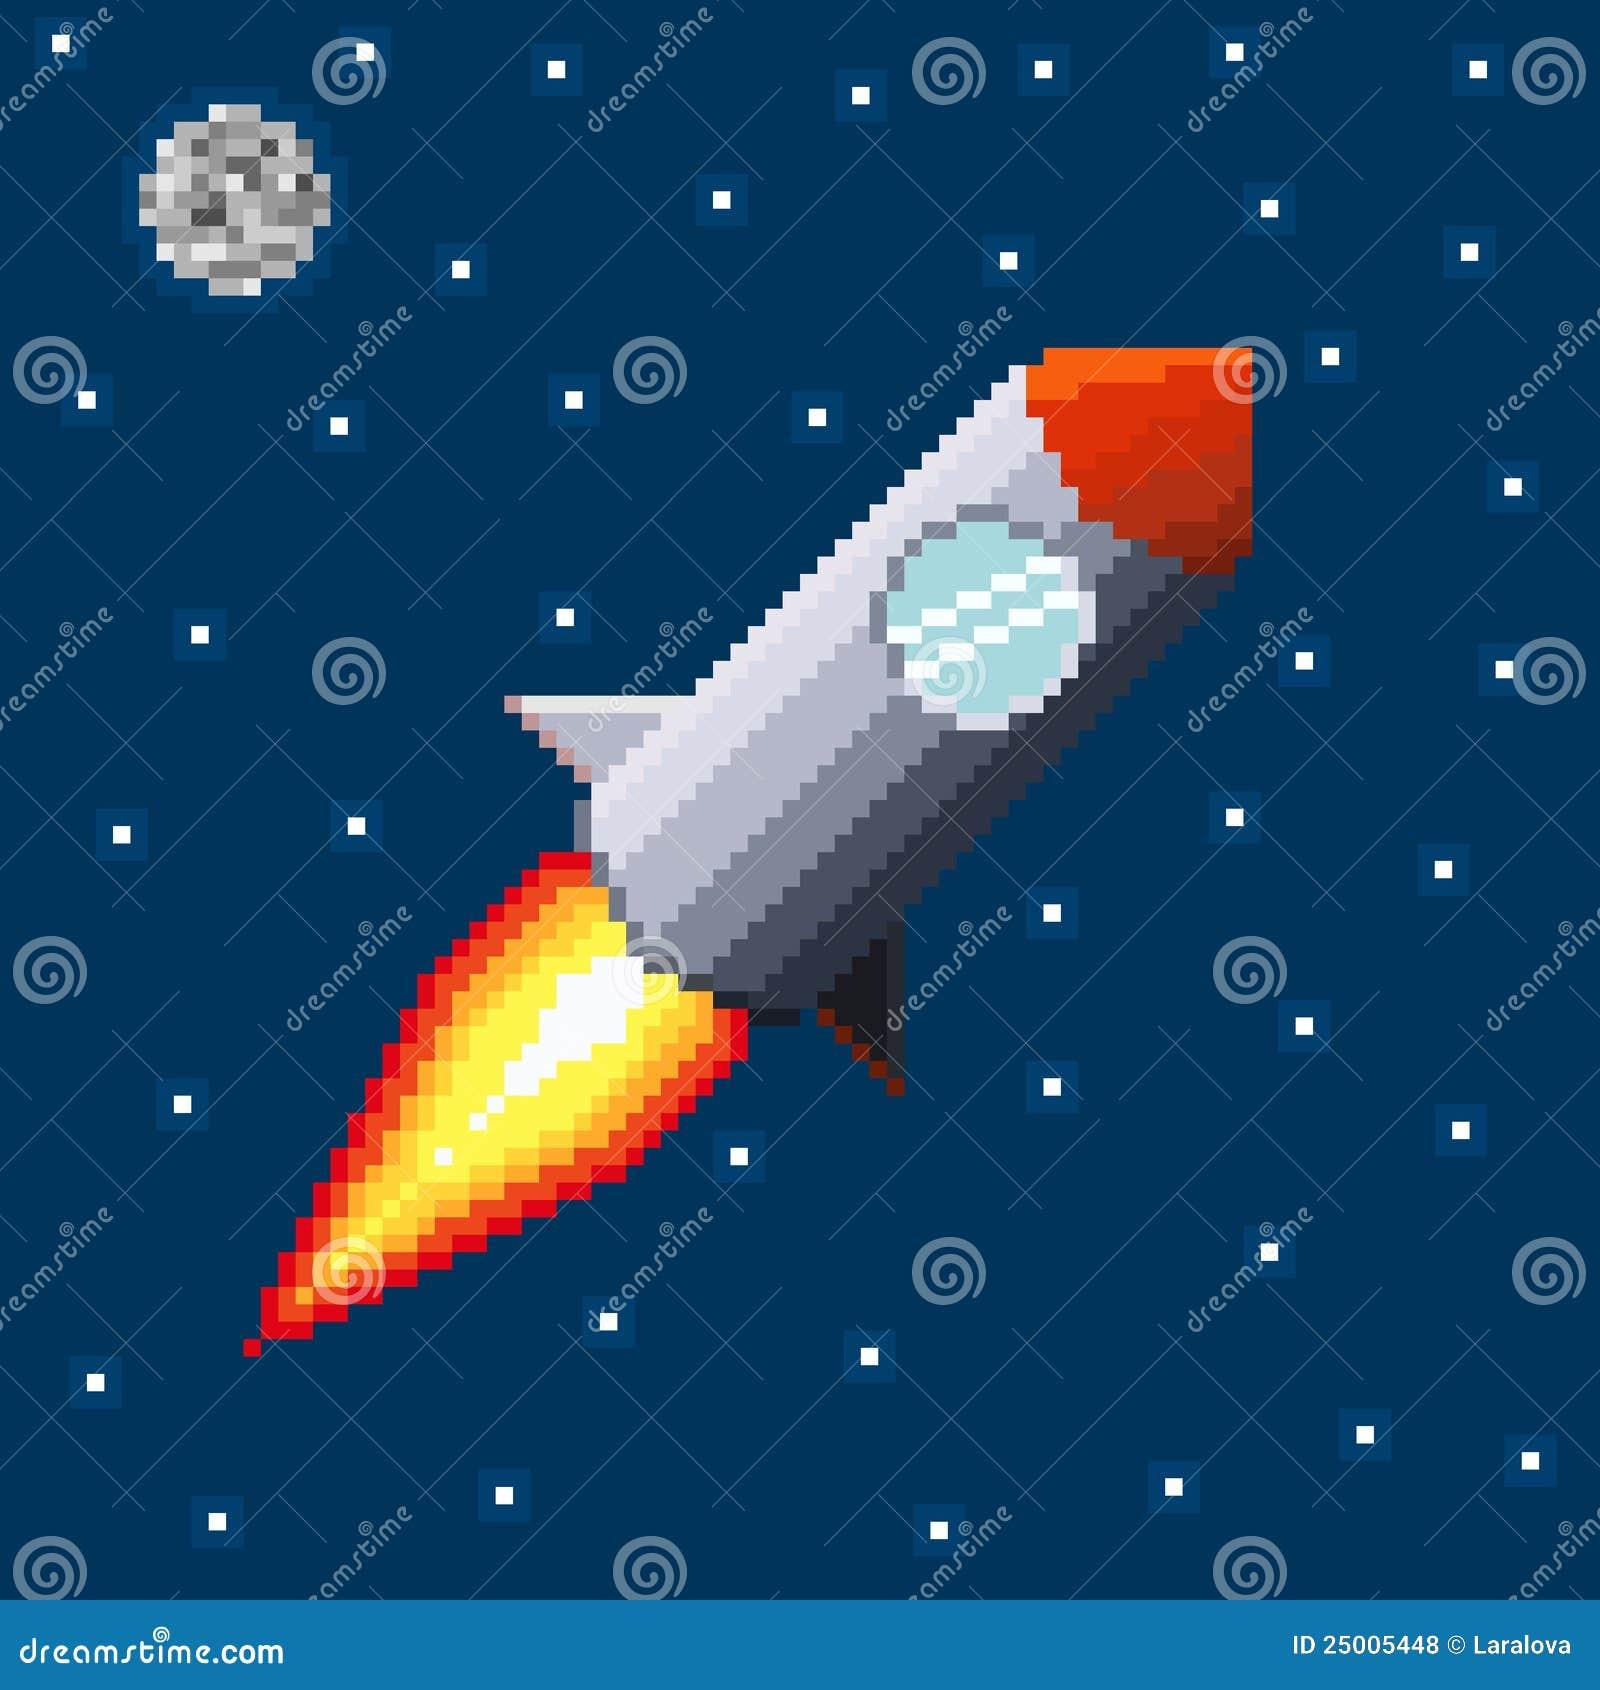 Pixel Rocket In Space Stock Vector. Illustration Of